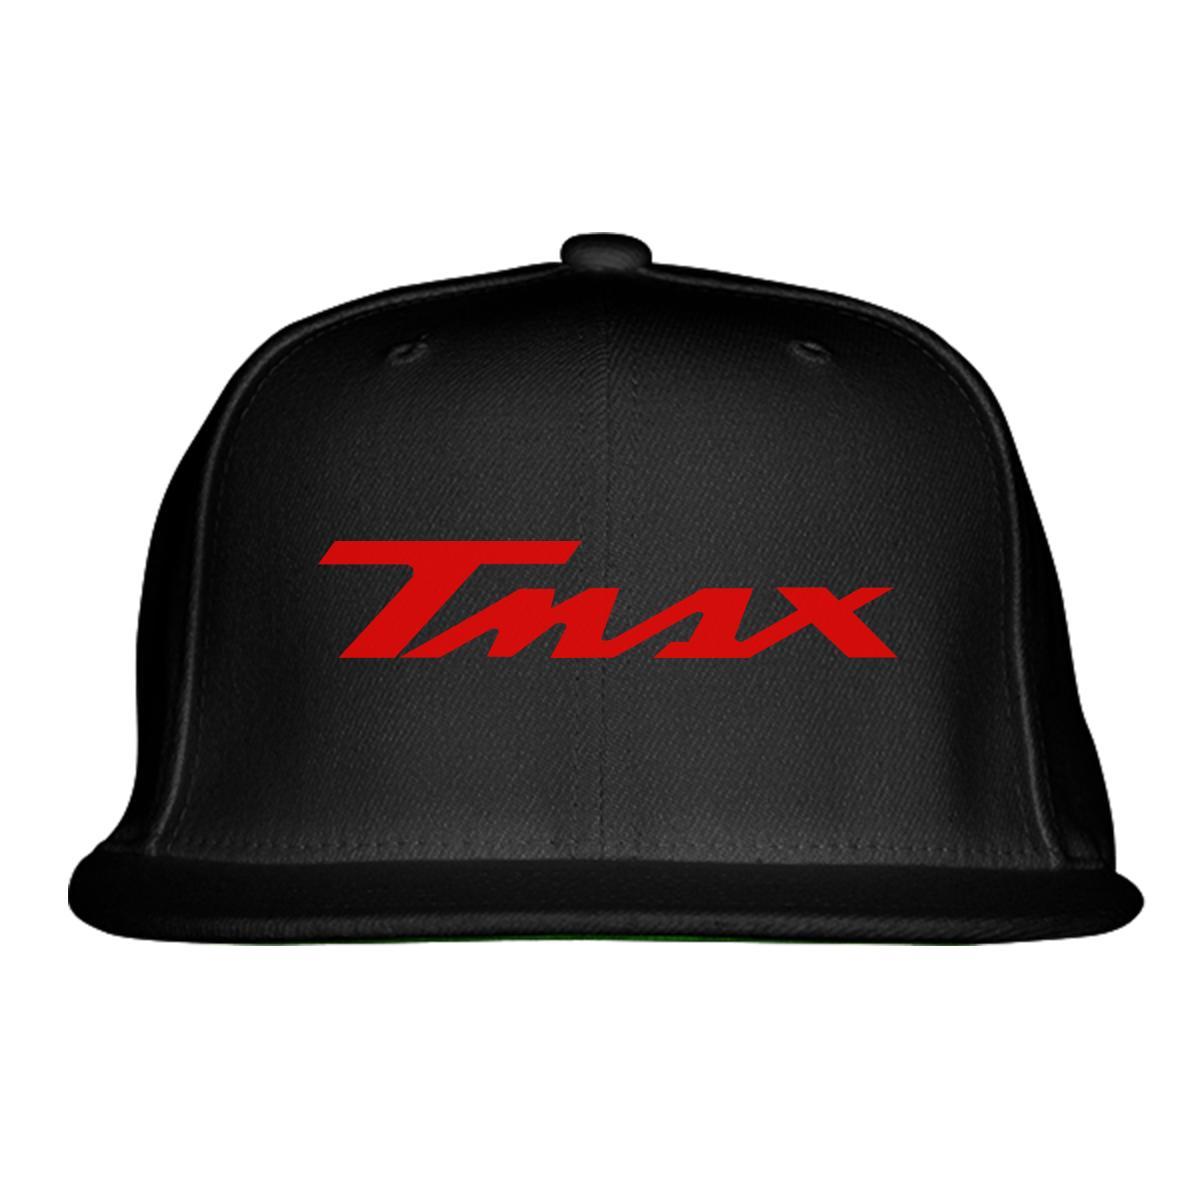 a8064b76b2a Yamaha tmax logo snapback hat jpg 1200x1200 Yamaha ball cap